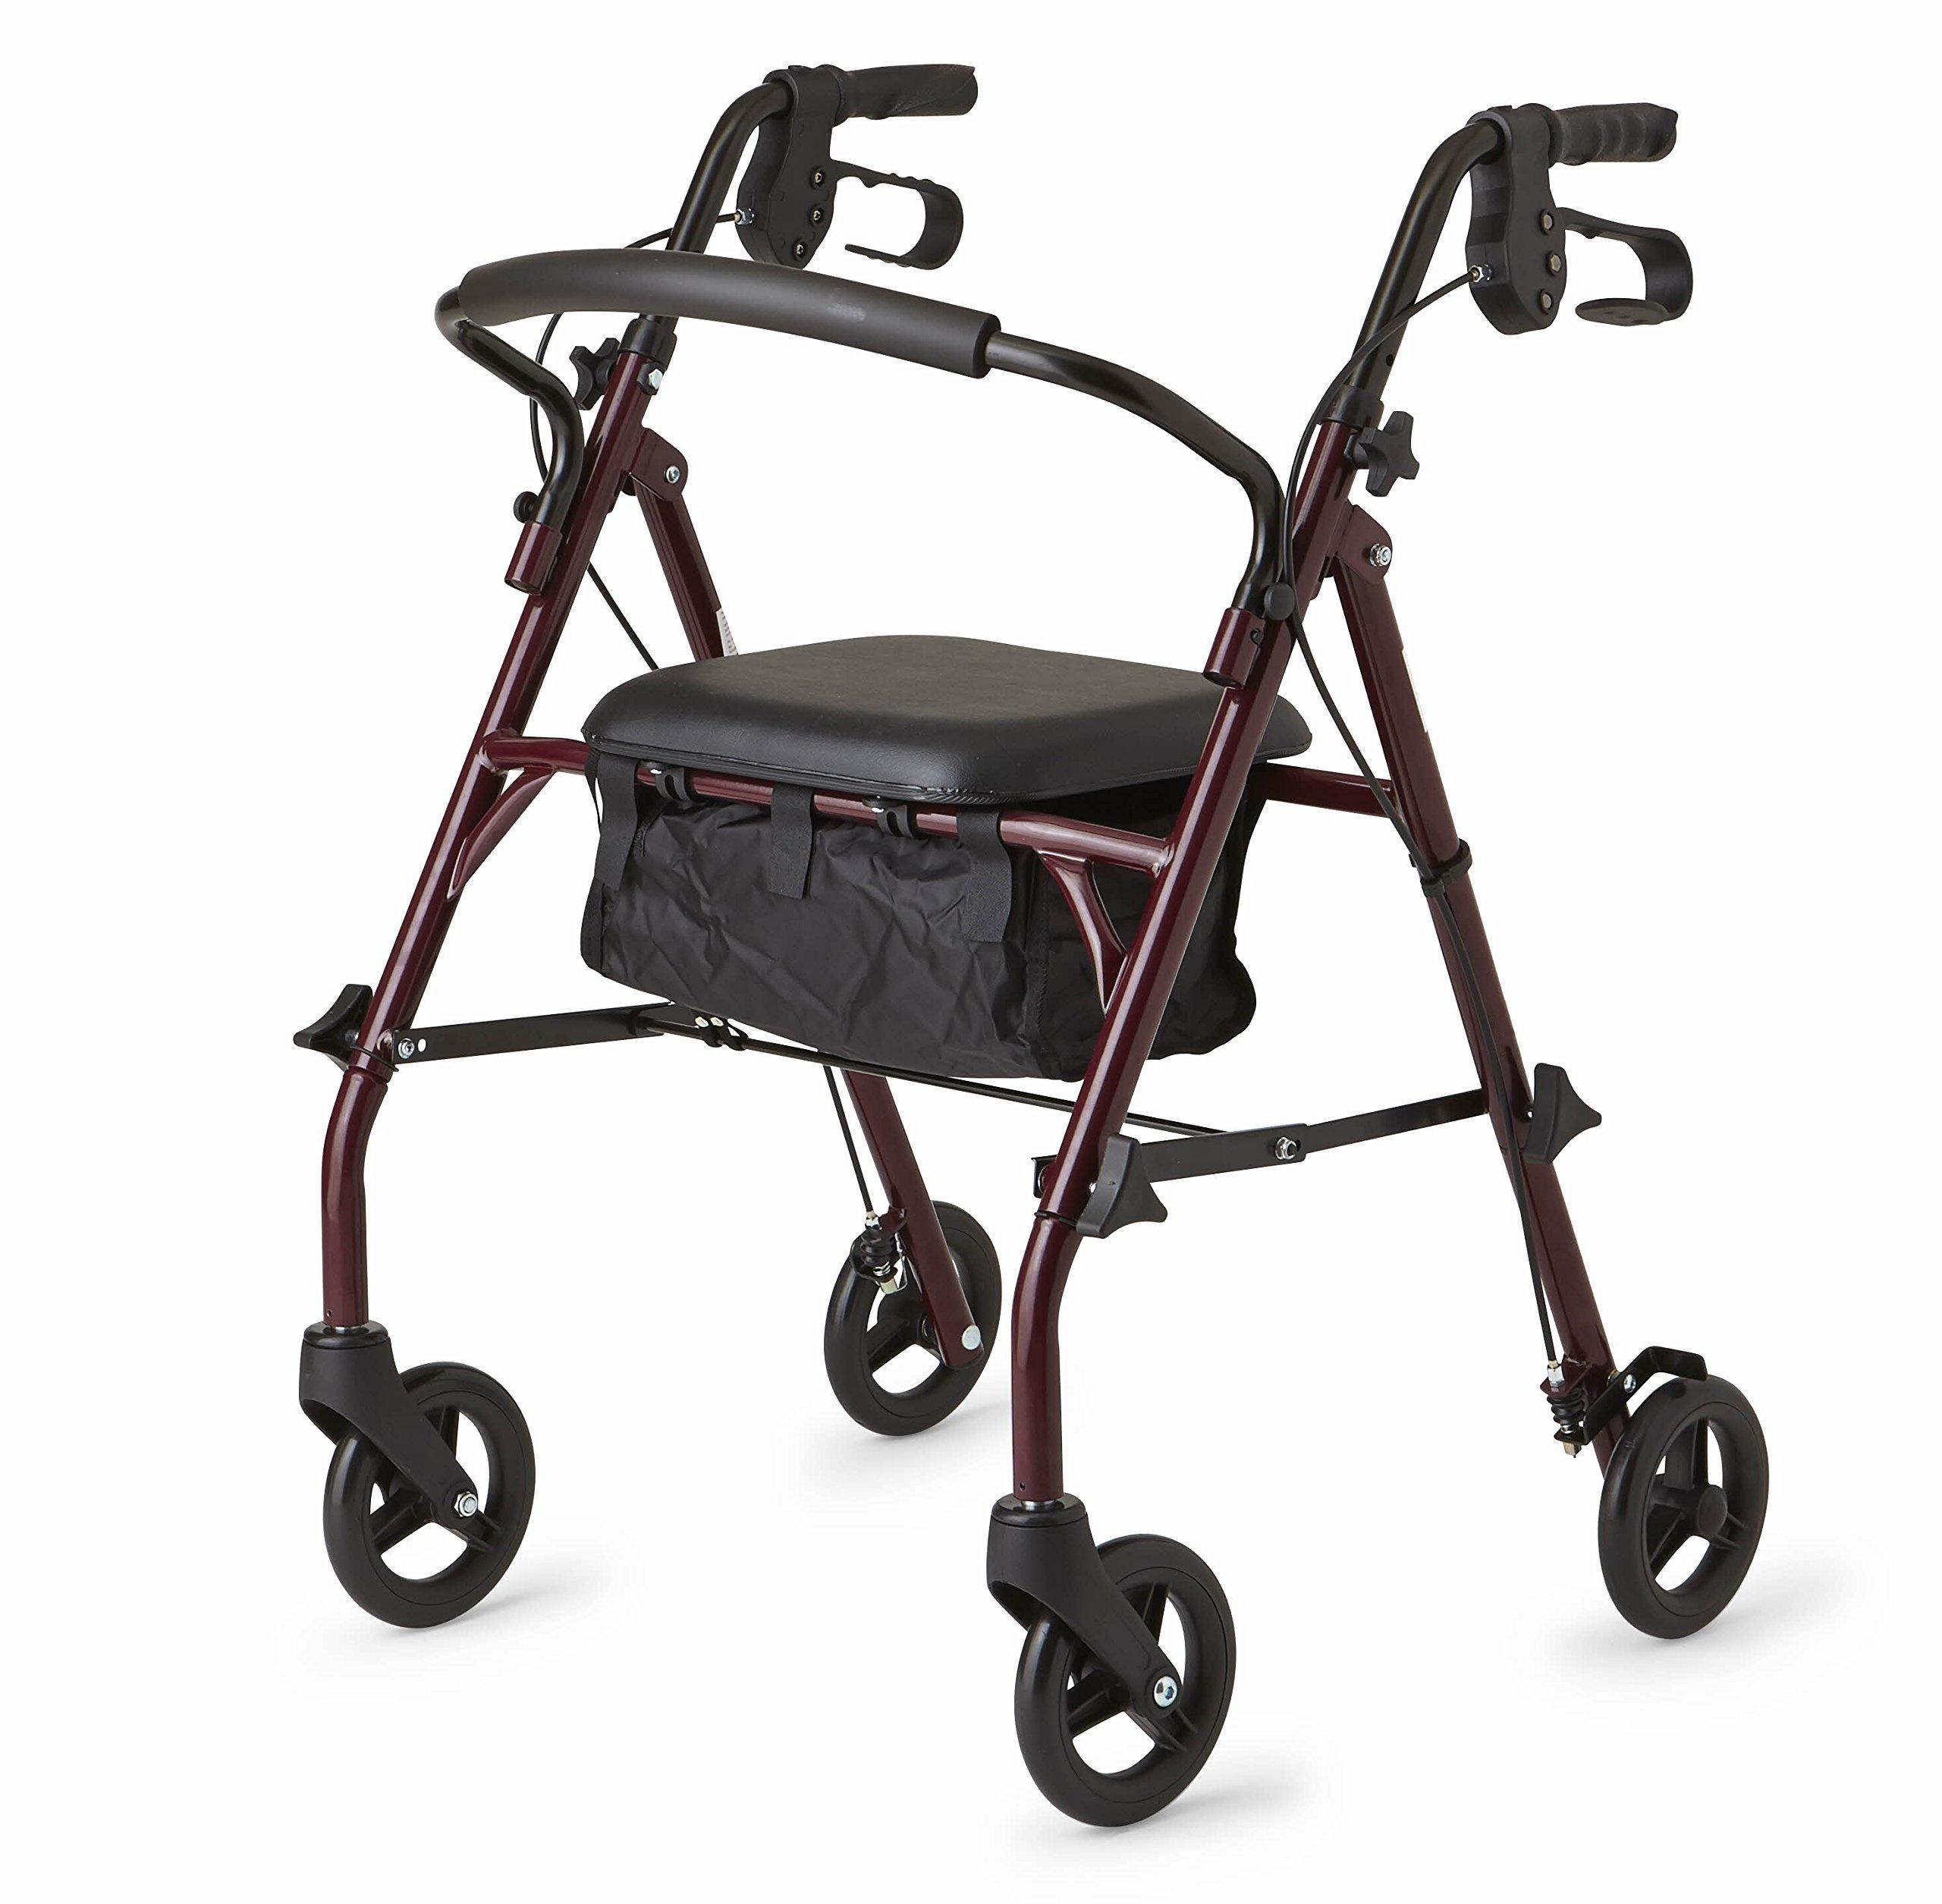 Healthcare Direct 100RA Steel Rollator Walker with 350 lb. Weight Capacity, Burgundy